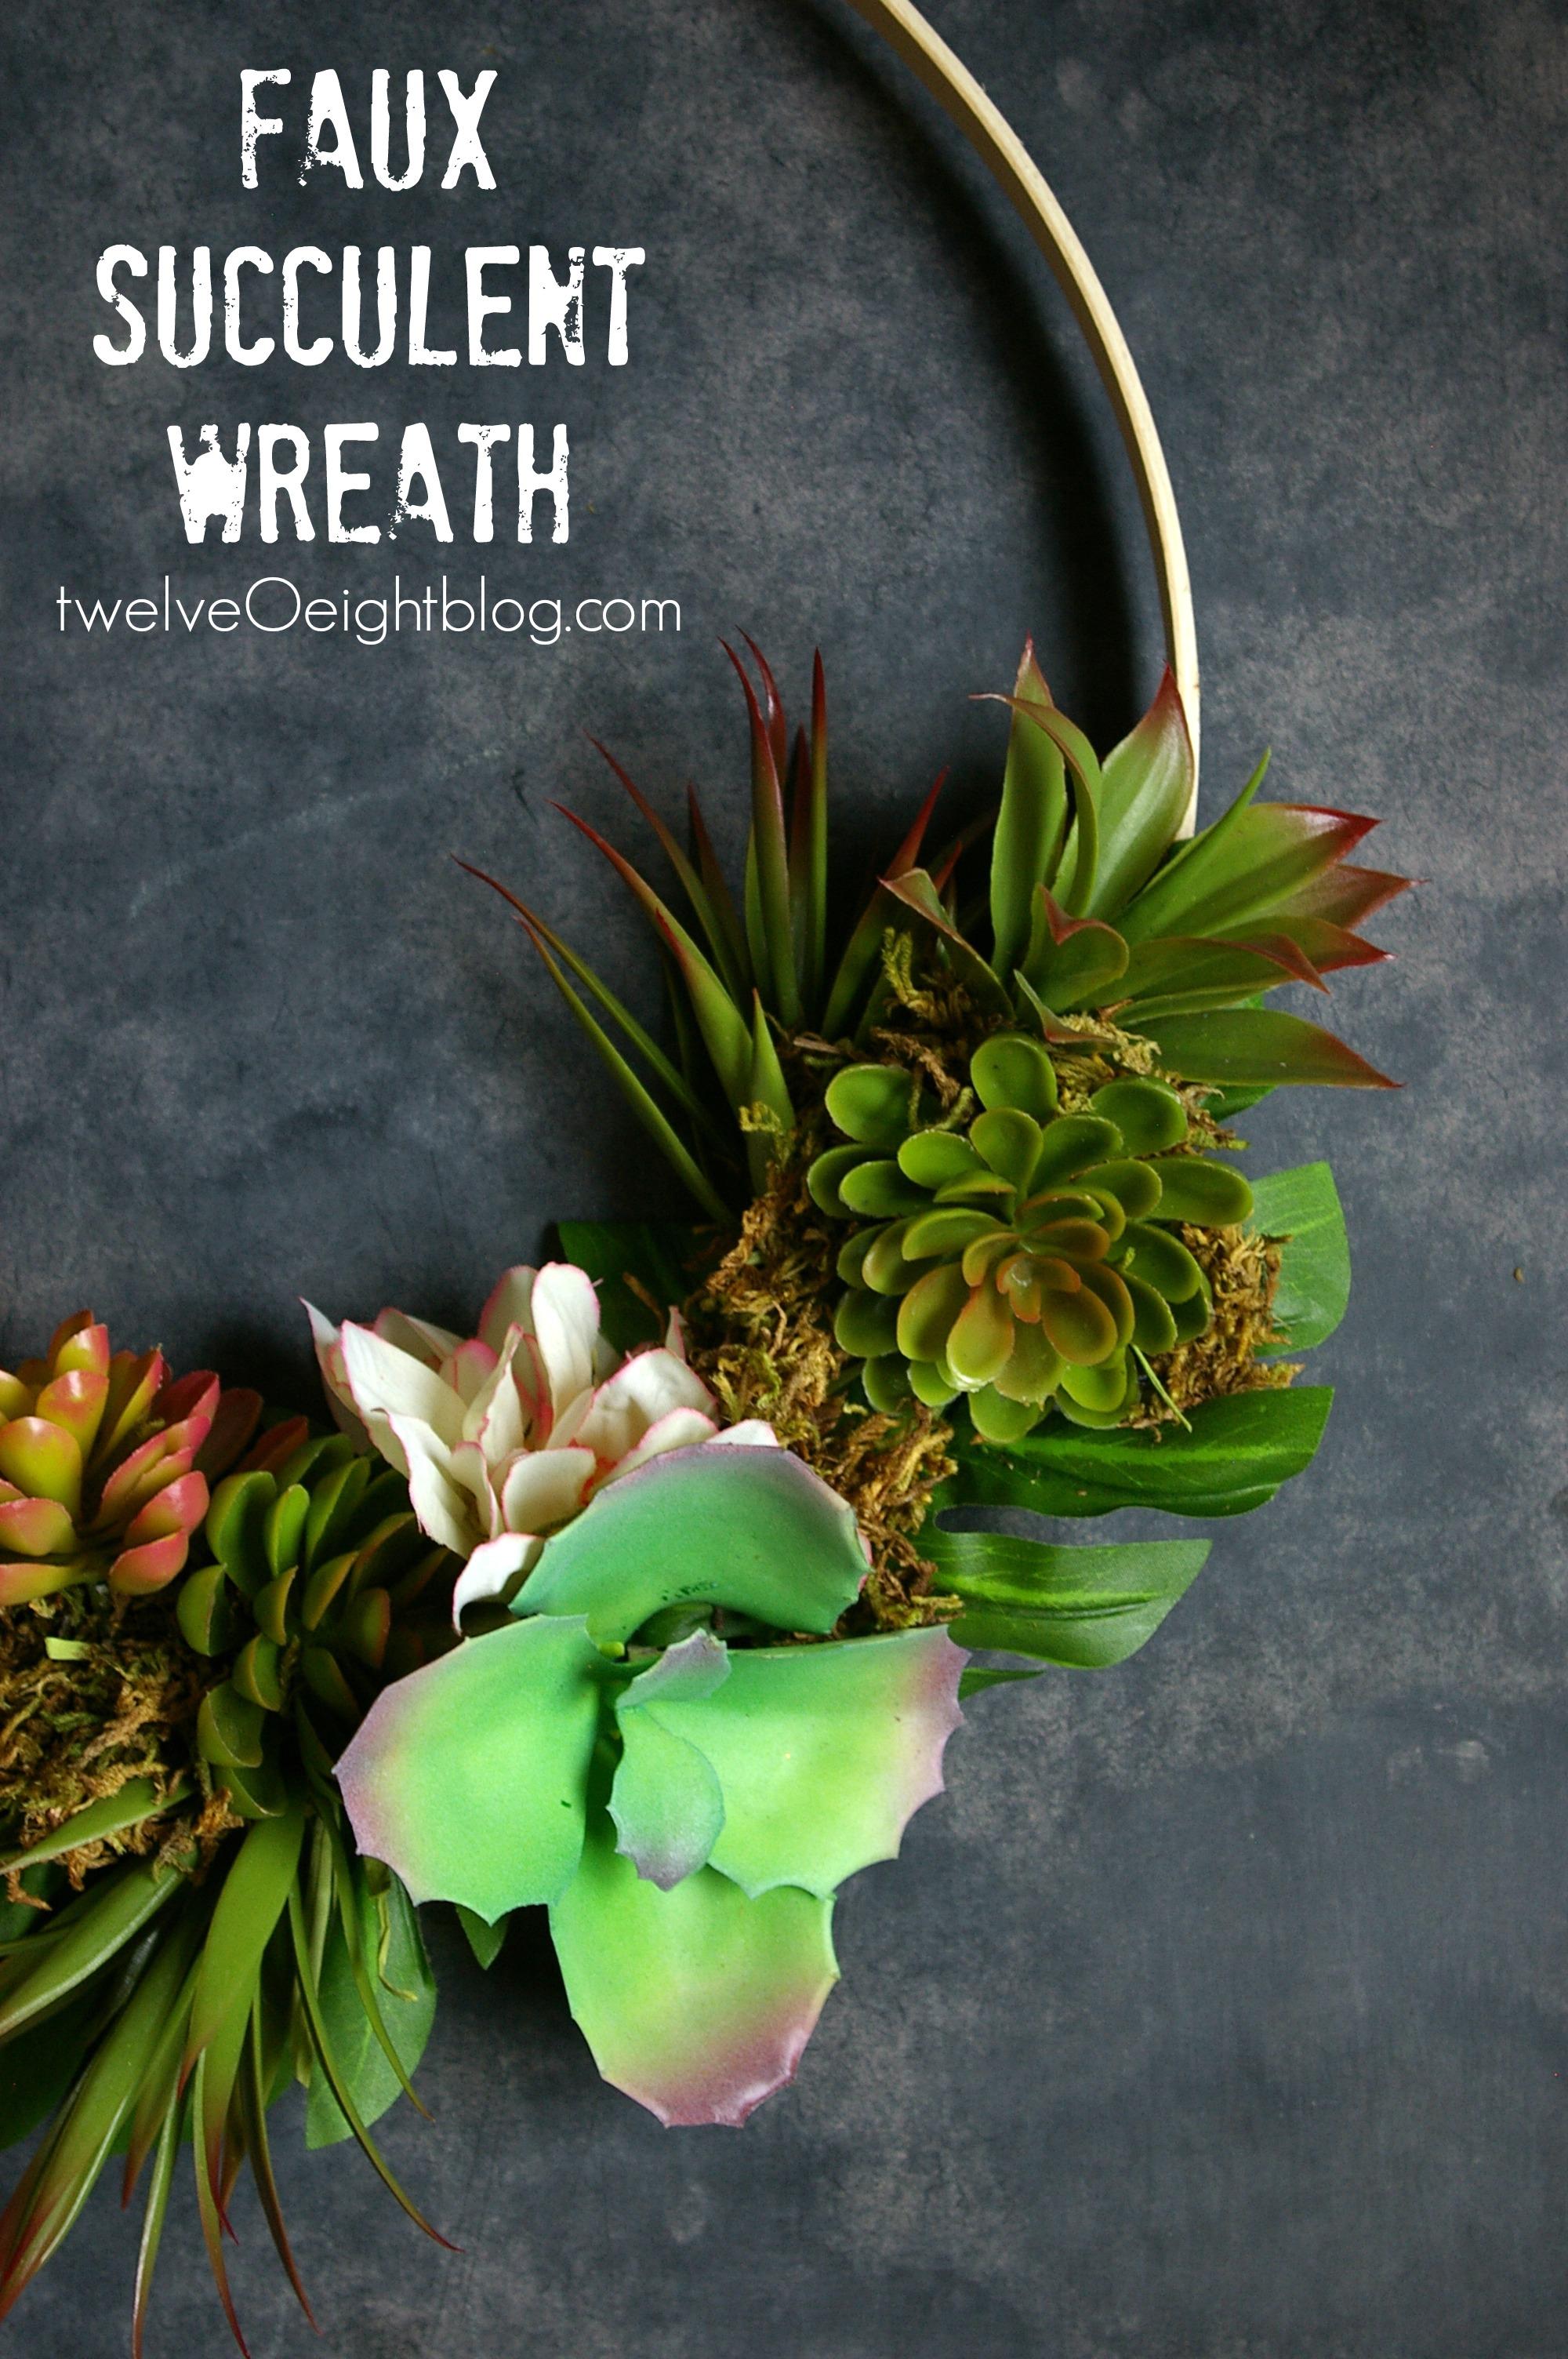 Faux Succulent Wreath Twelveoeight